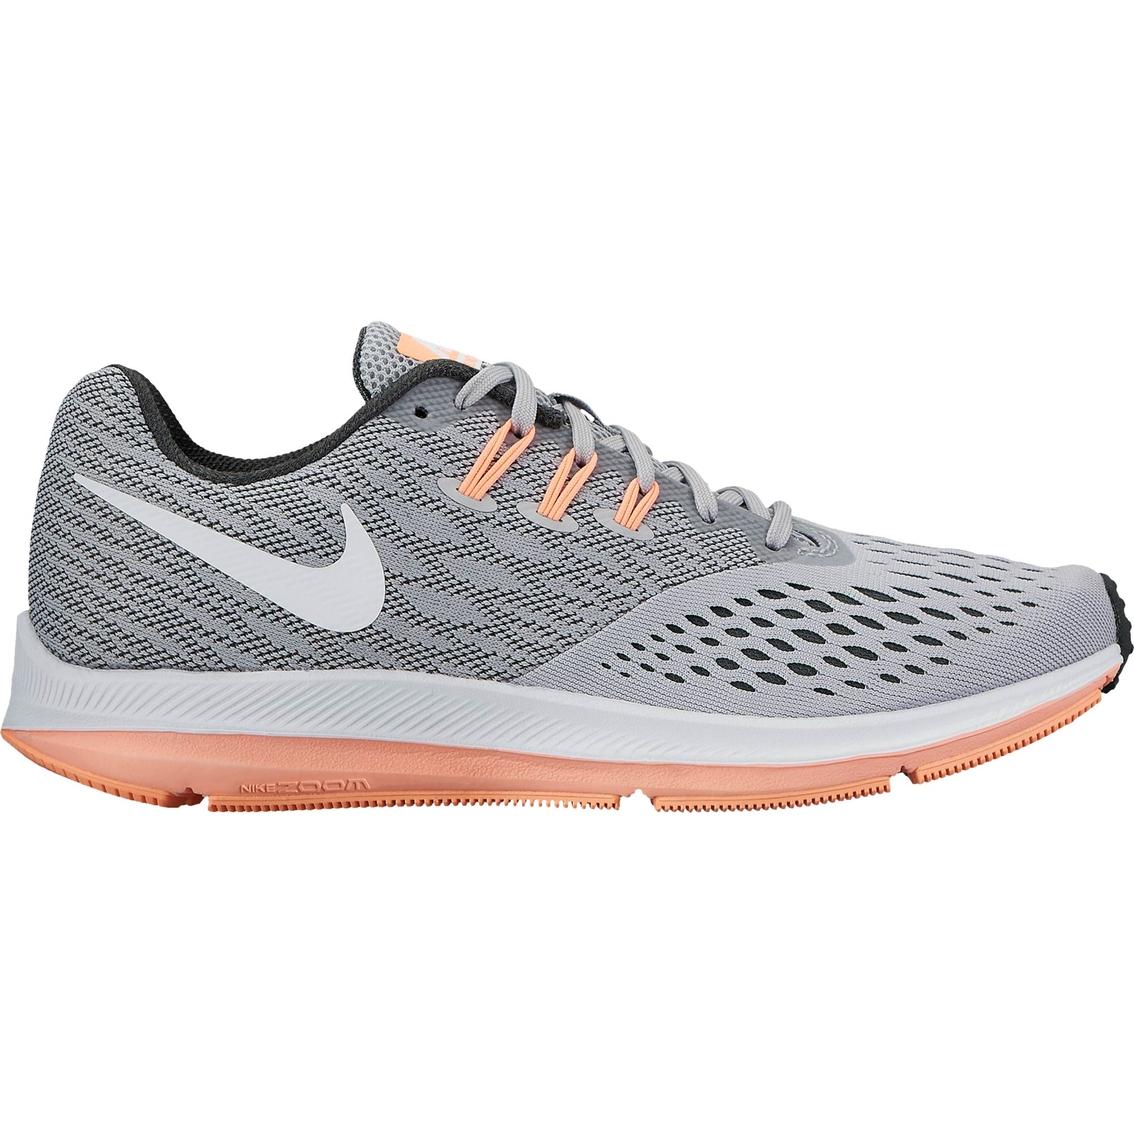 Nike Zoom Womens Running Shoes